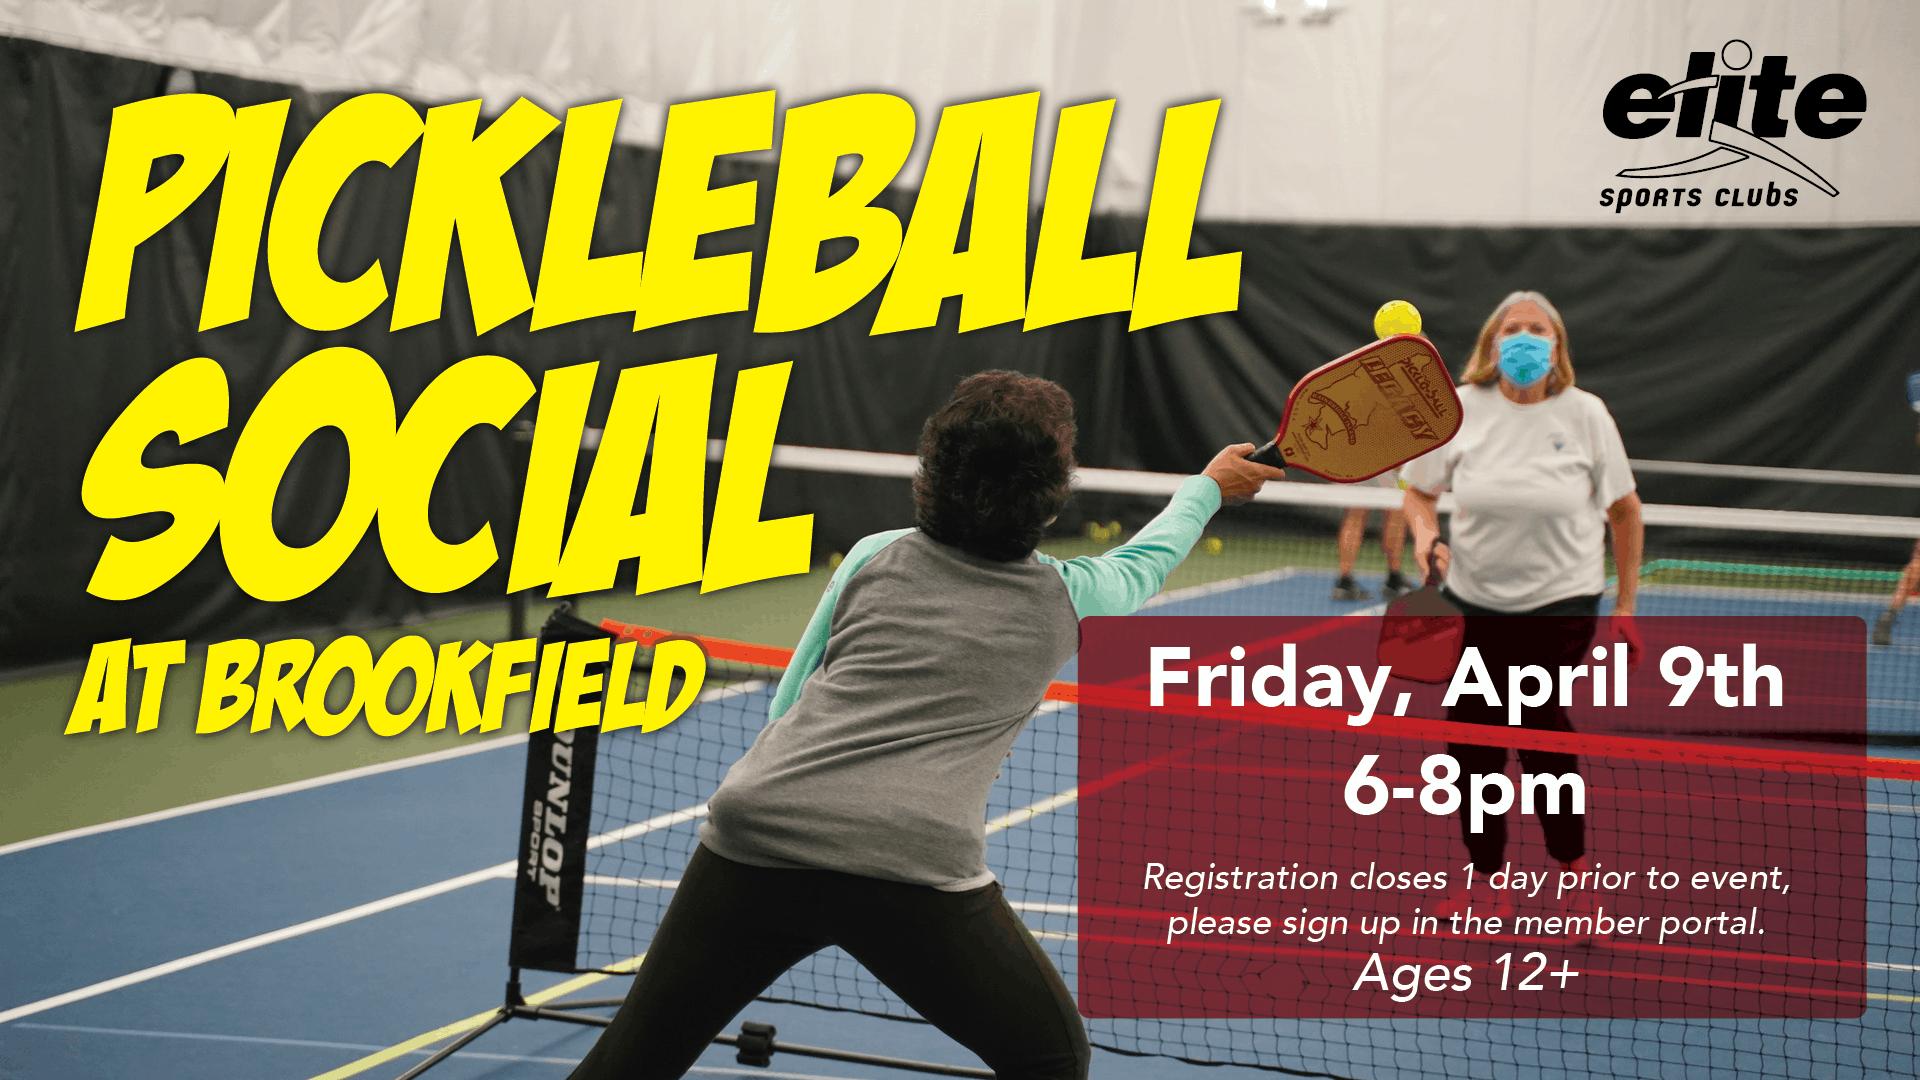 Pickleball Social - Elite Brookfield - April 2021